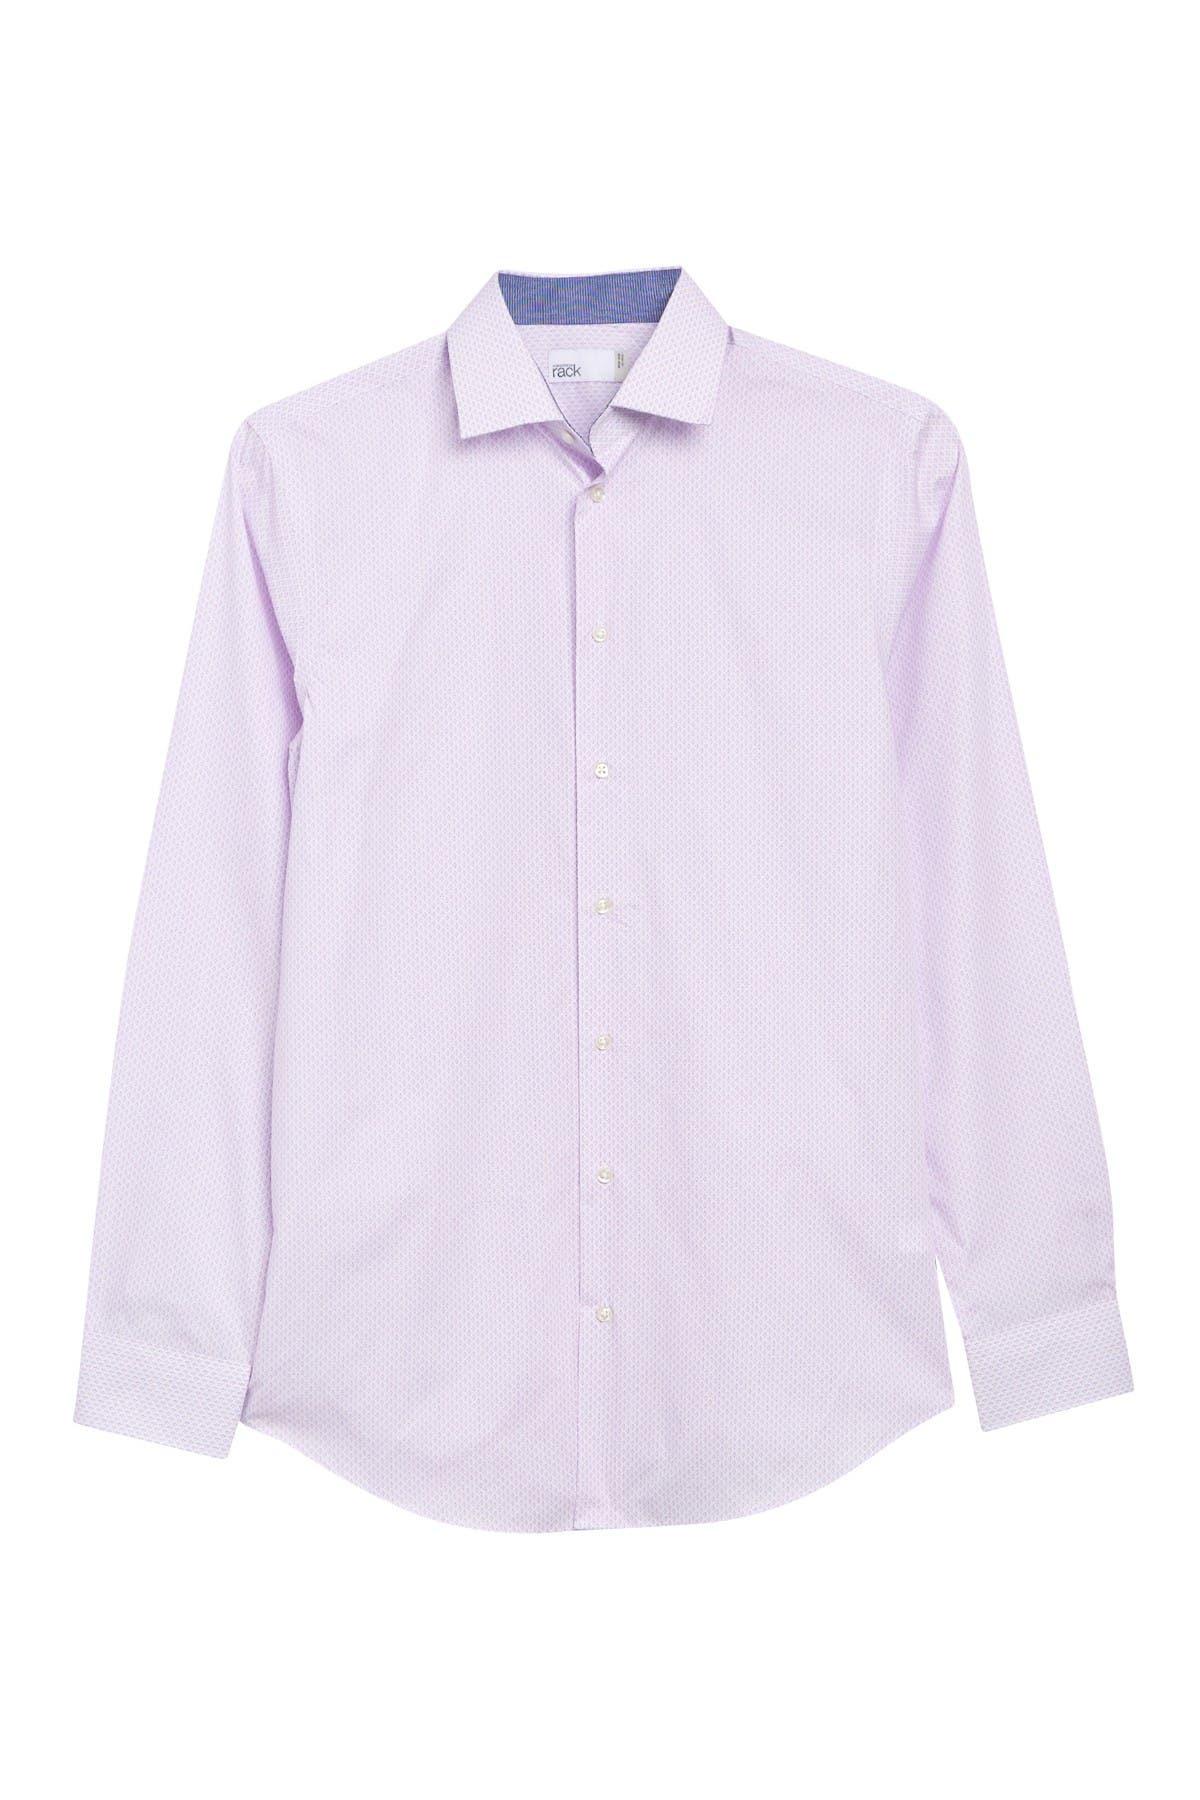 Image of Nordstrom Rack Neat Print Dress Shirt